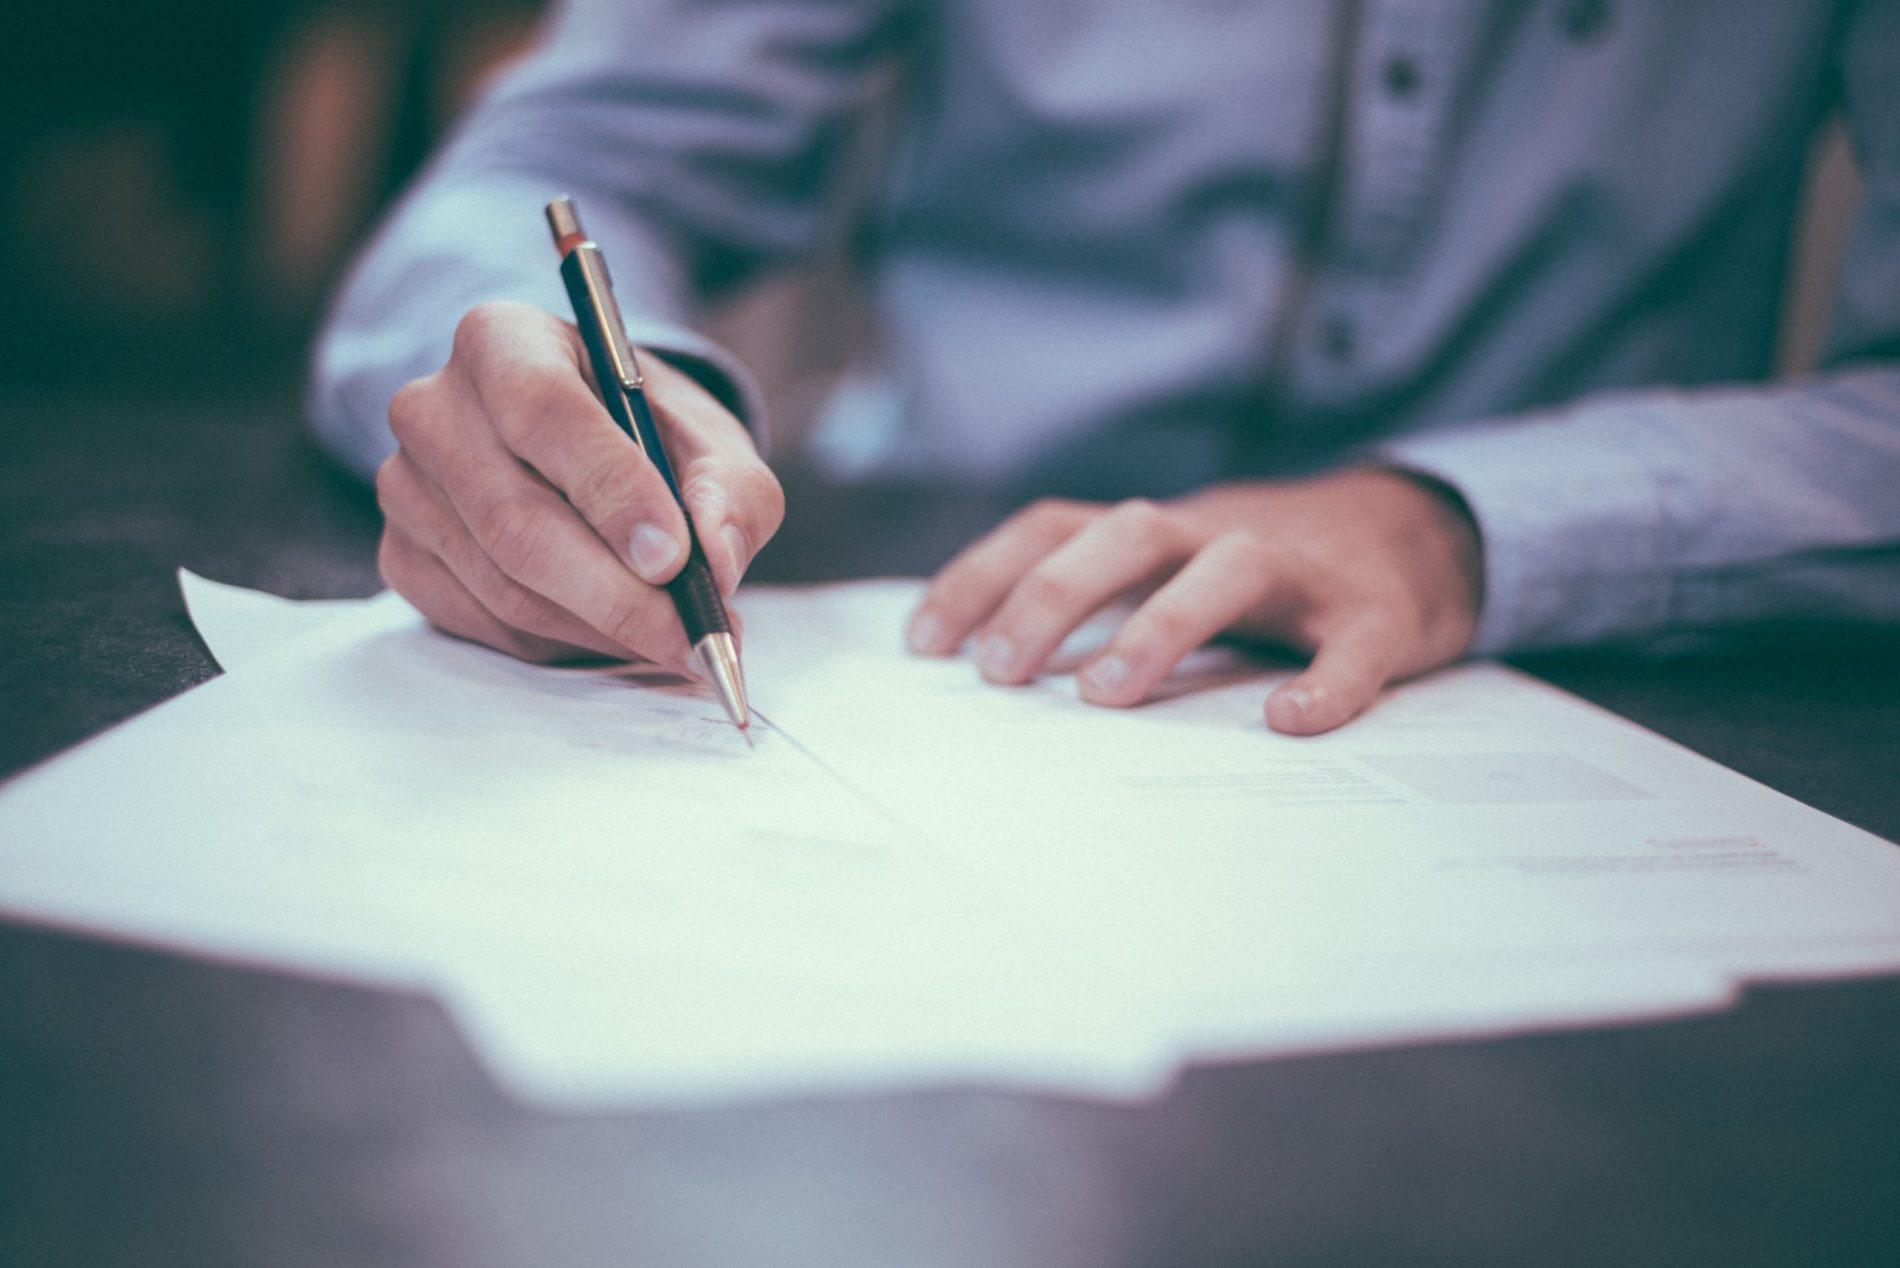 7 consejos prácticos para renegociar contratos de alquiler corporativo